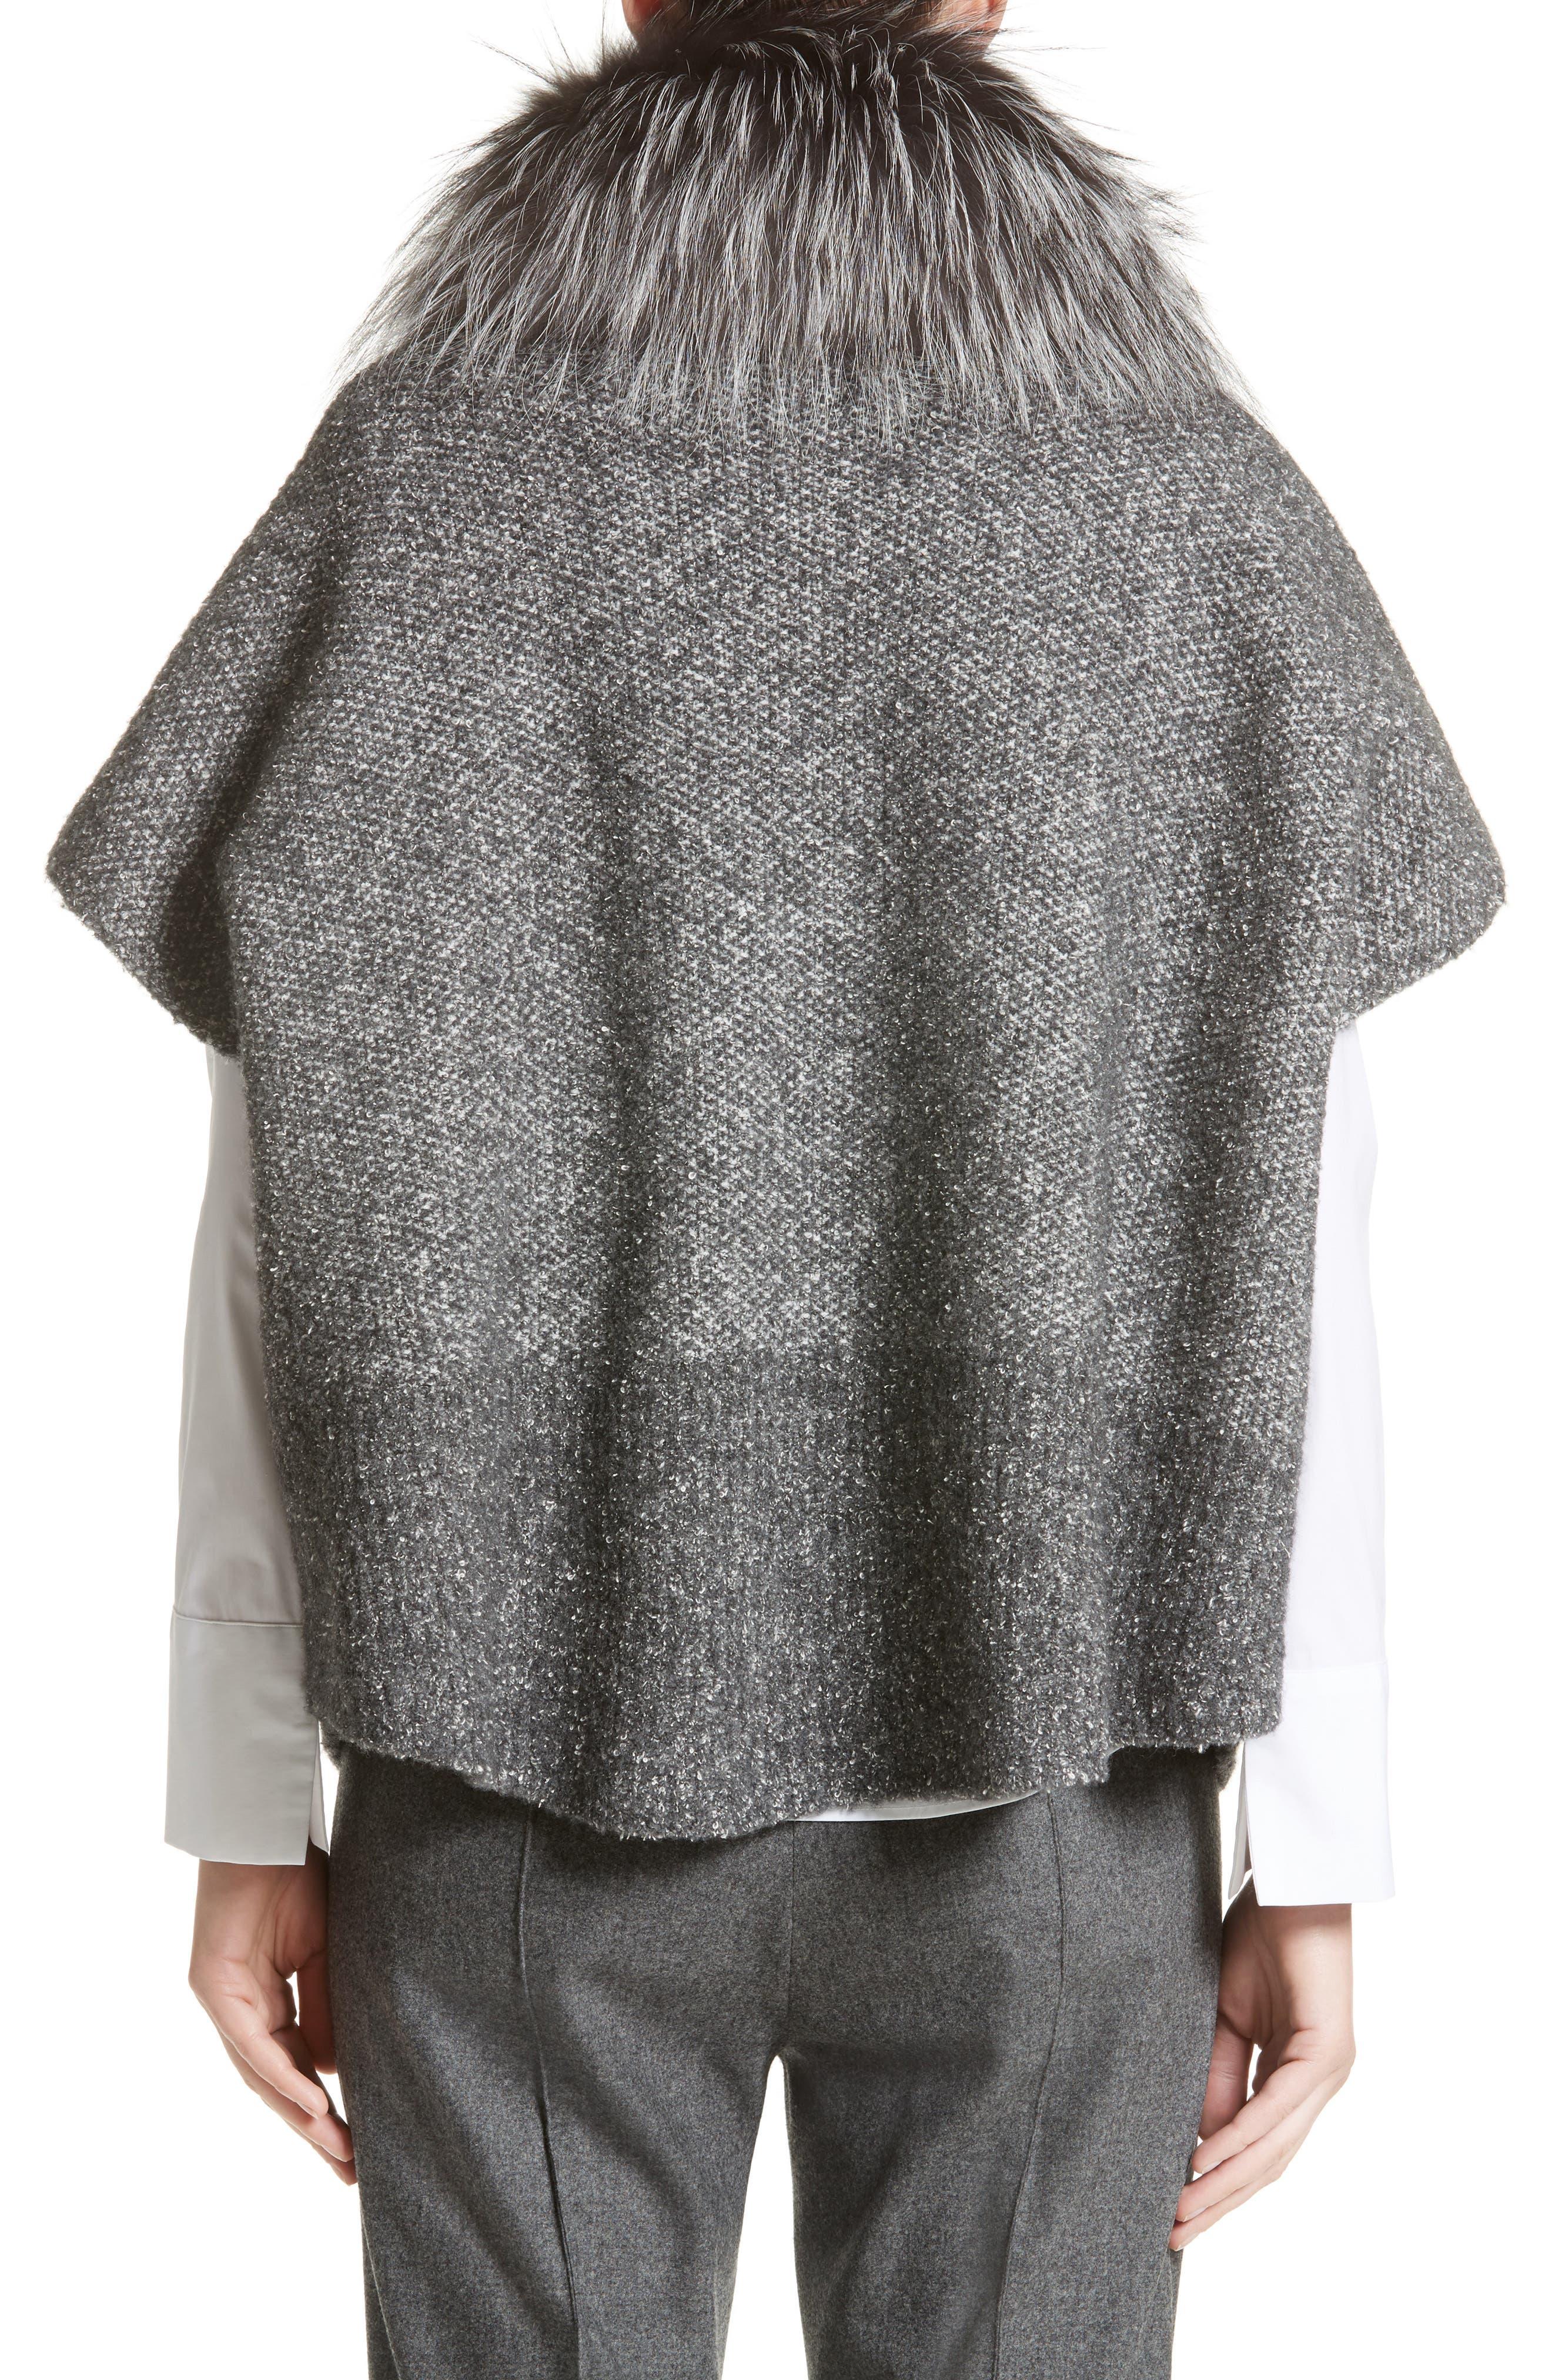 Pebble Tweed Knit Poncho with Genuine Fox Fur Collar,                             Alternate thumbnail 2, color,                             Grey Multi